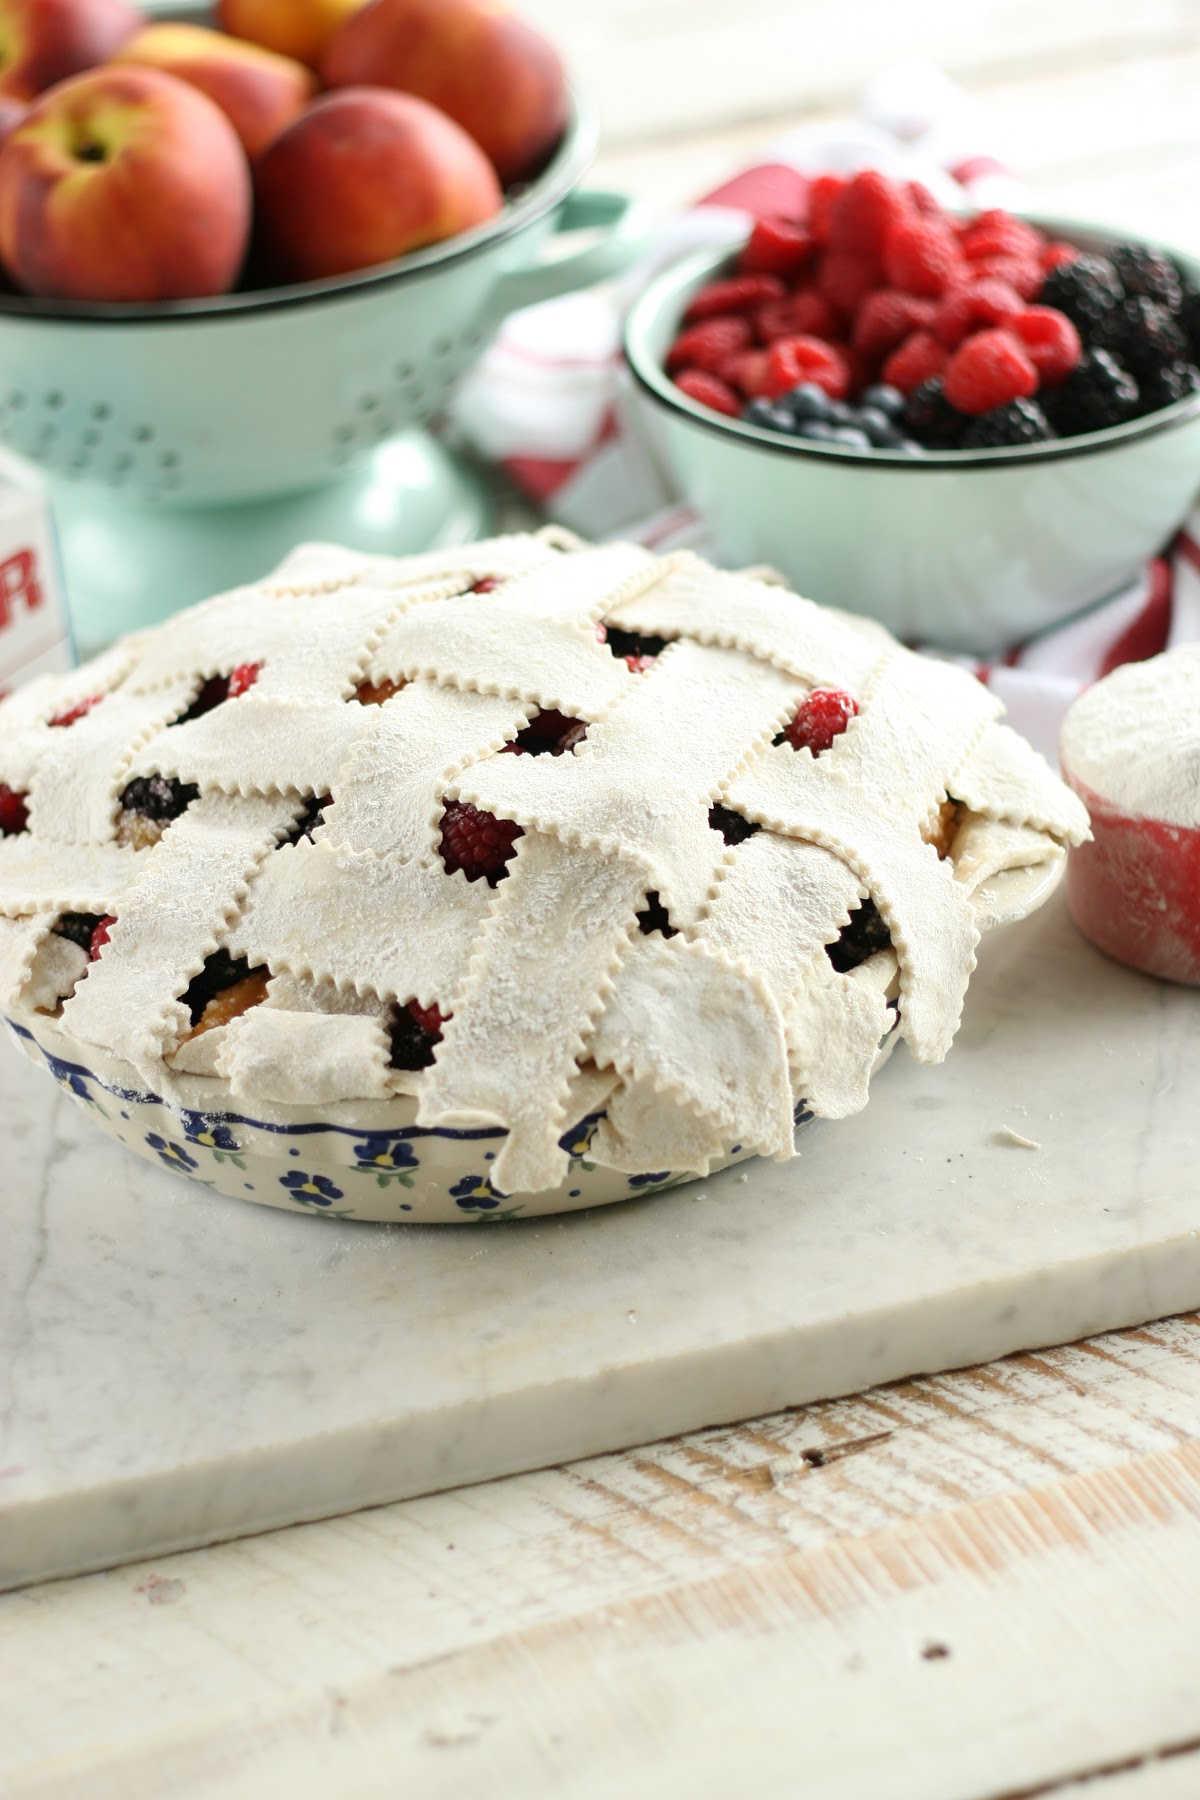 weaving lattice crust on berry pie in blue floral pie plate.